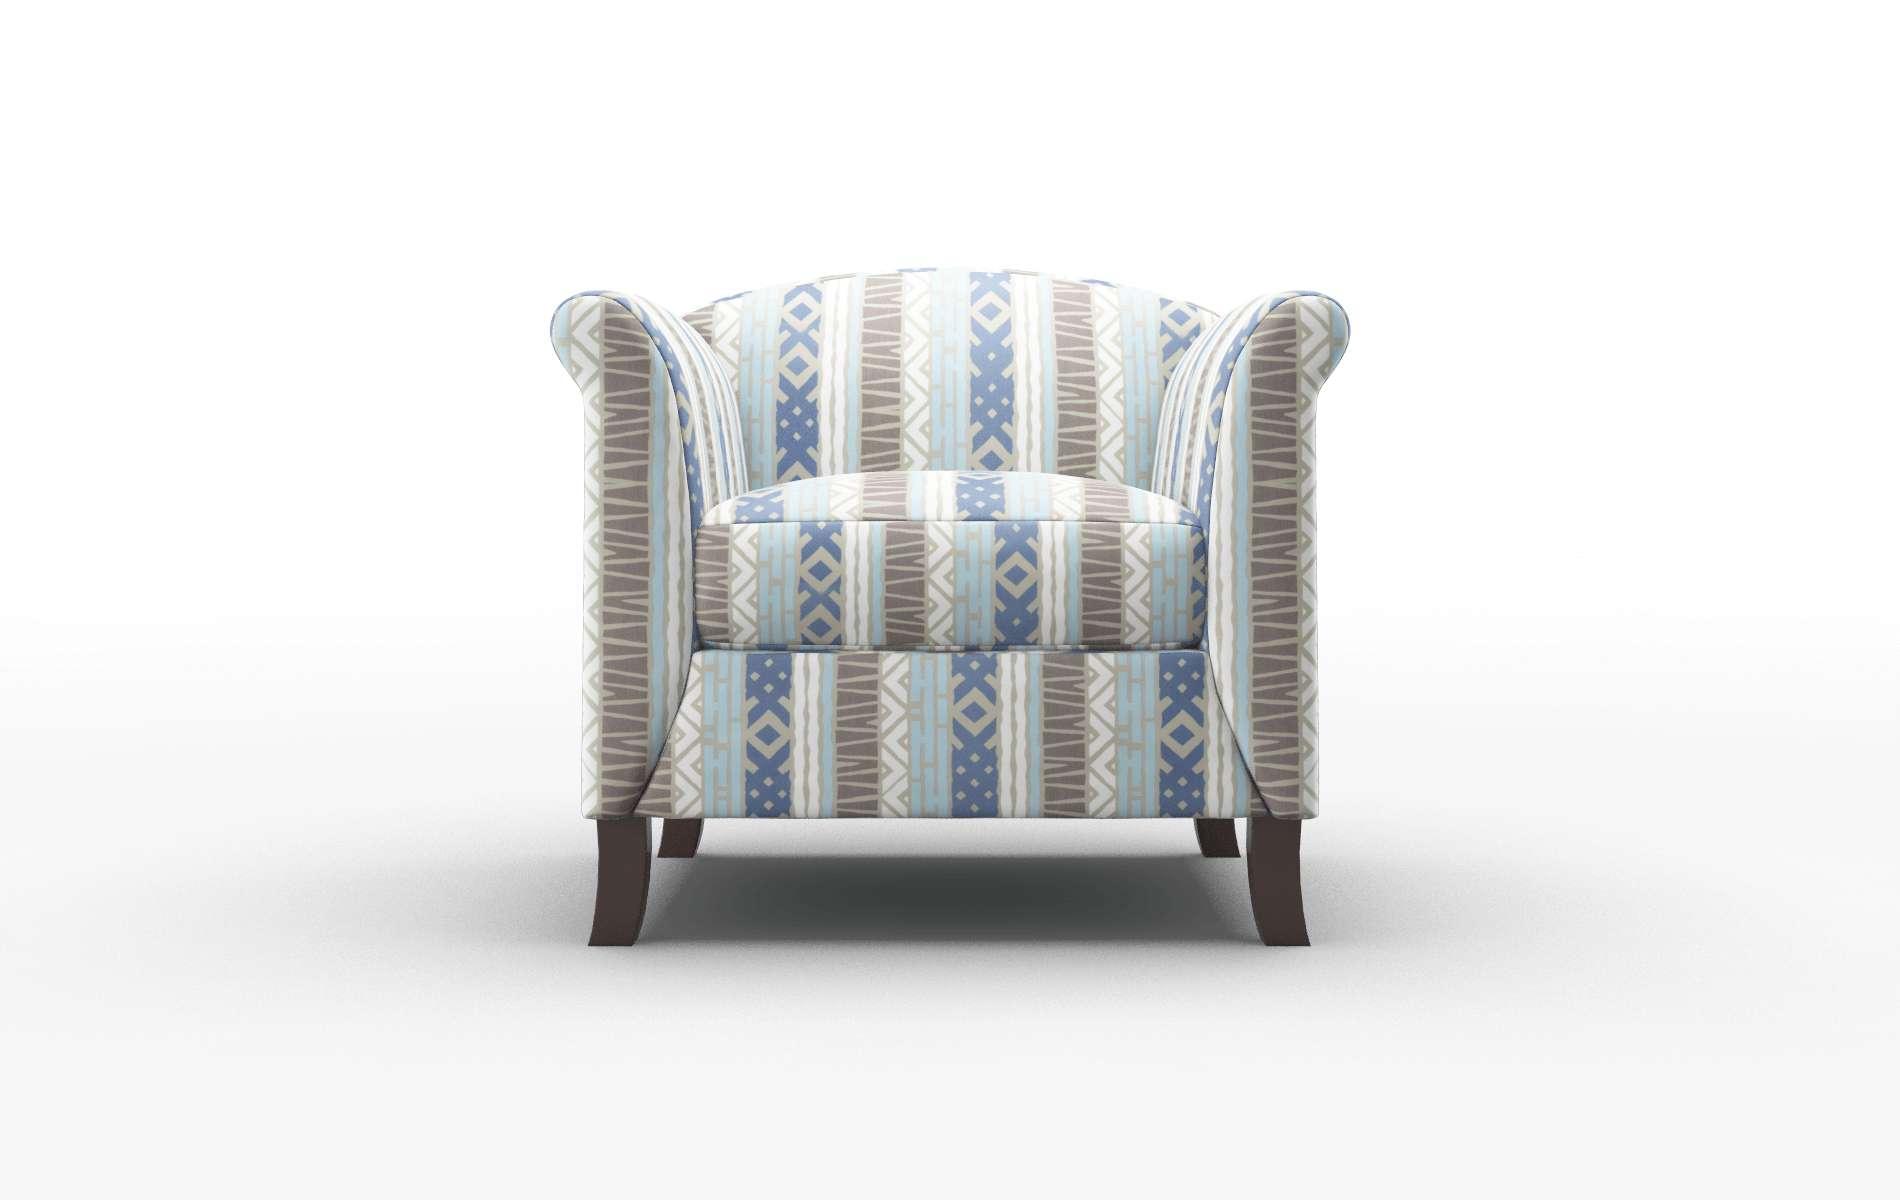 Crete Bodhi Indigo Chair espresso legs 1